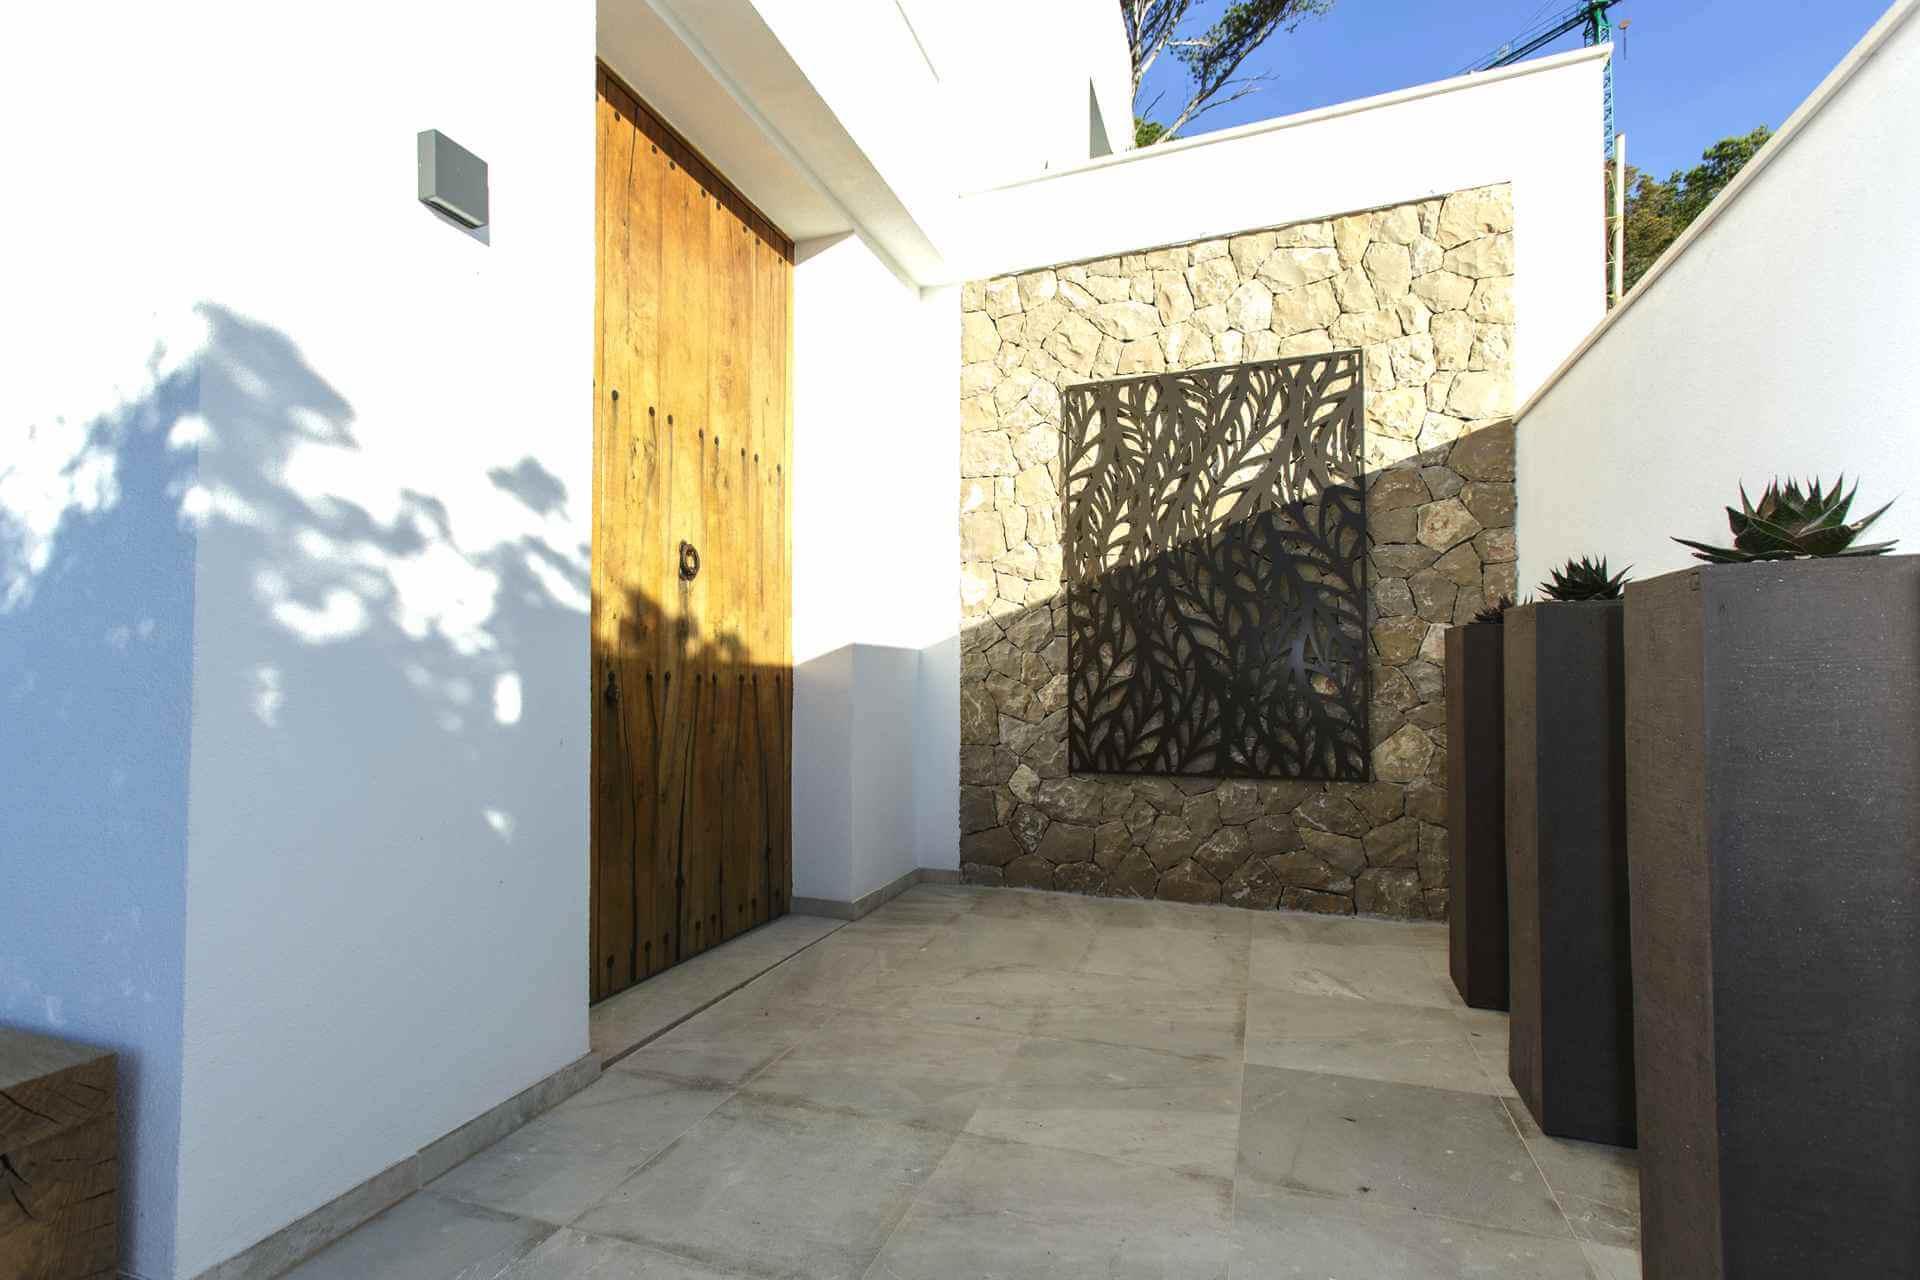 01-353 Villa with indoor pool Mallorca Southwest Bild 9